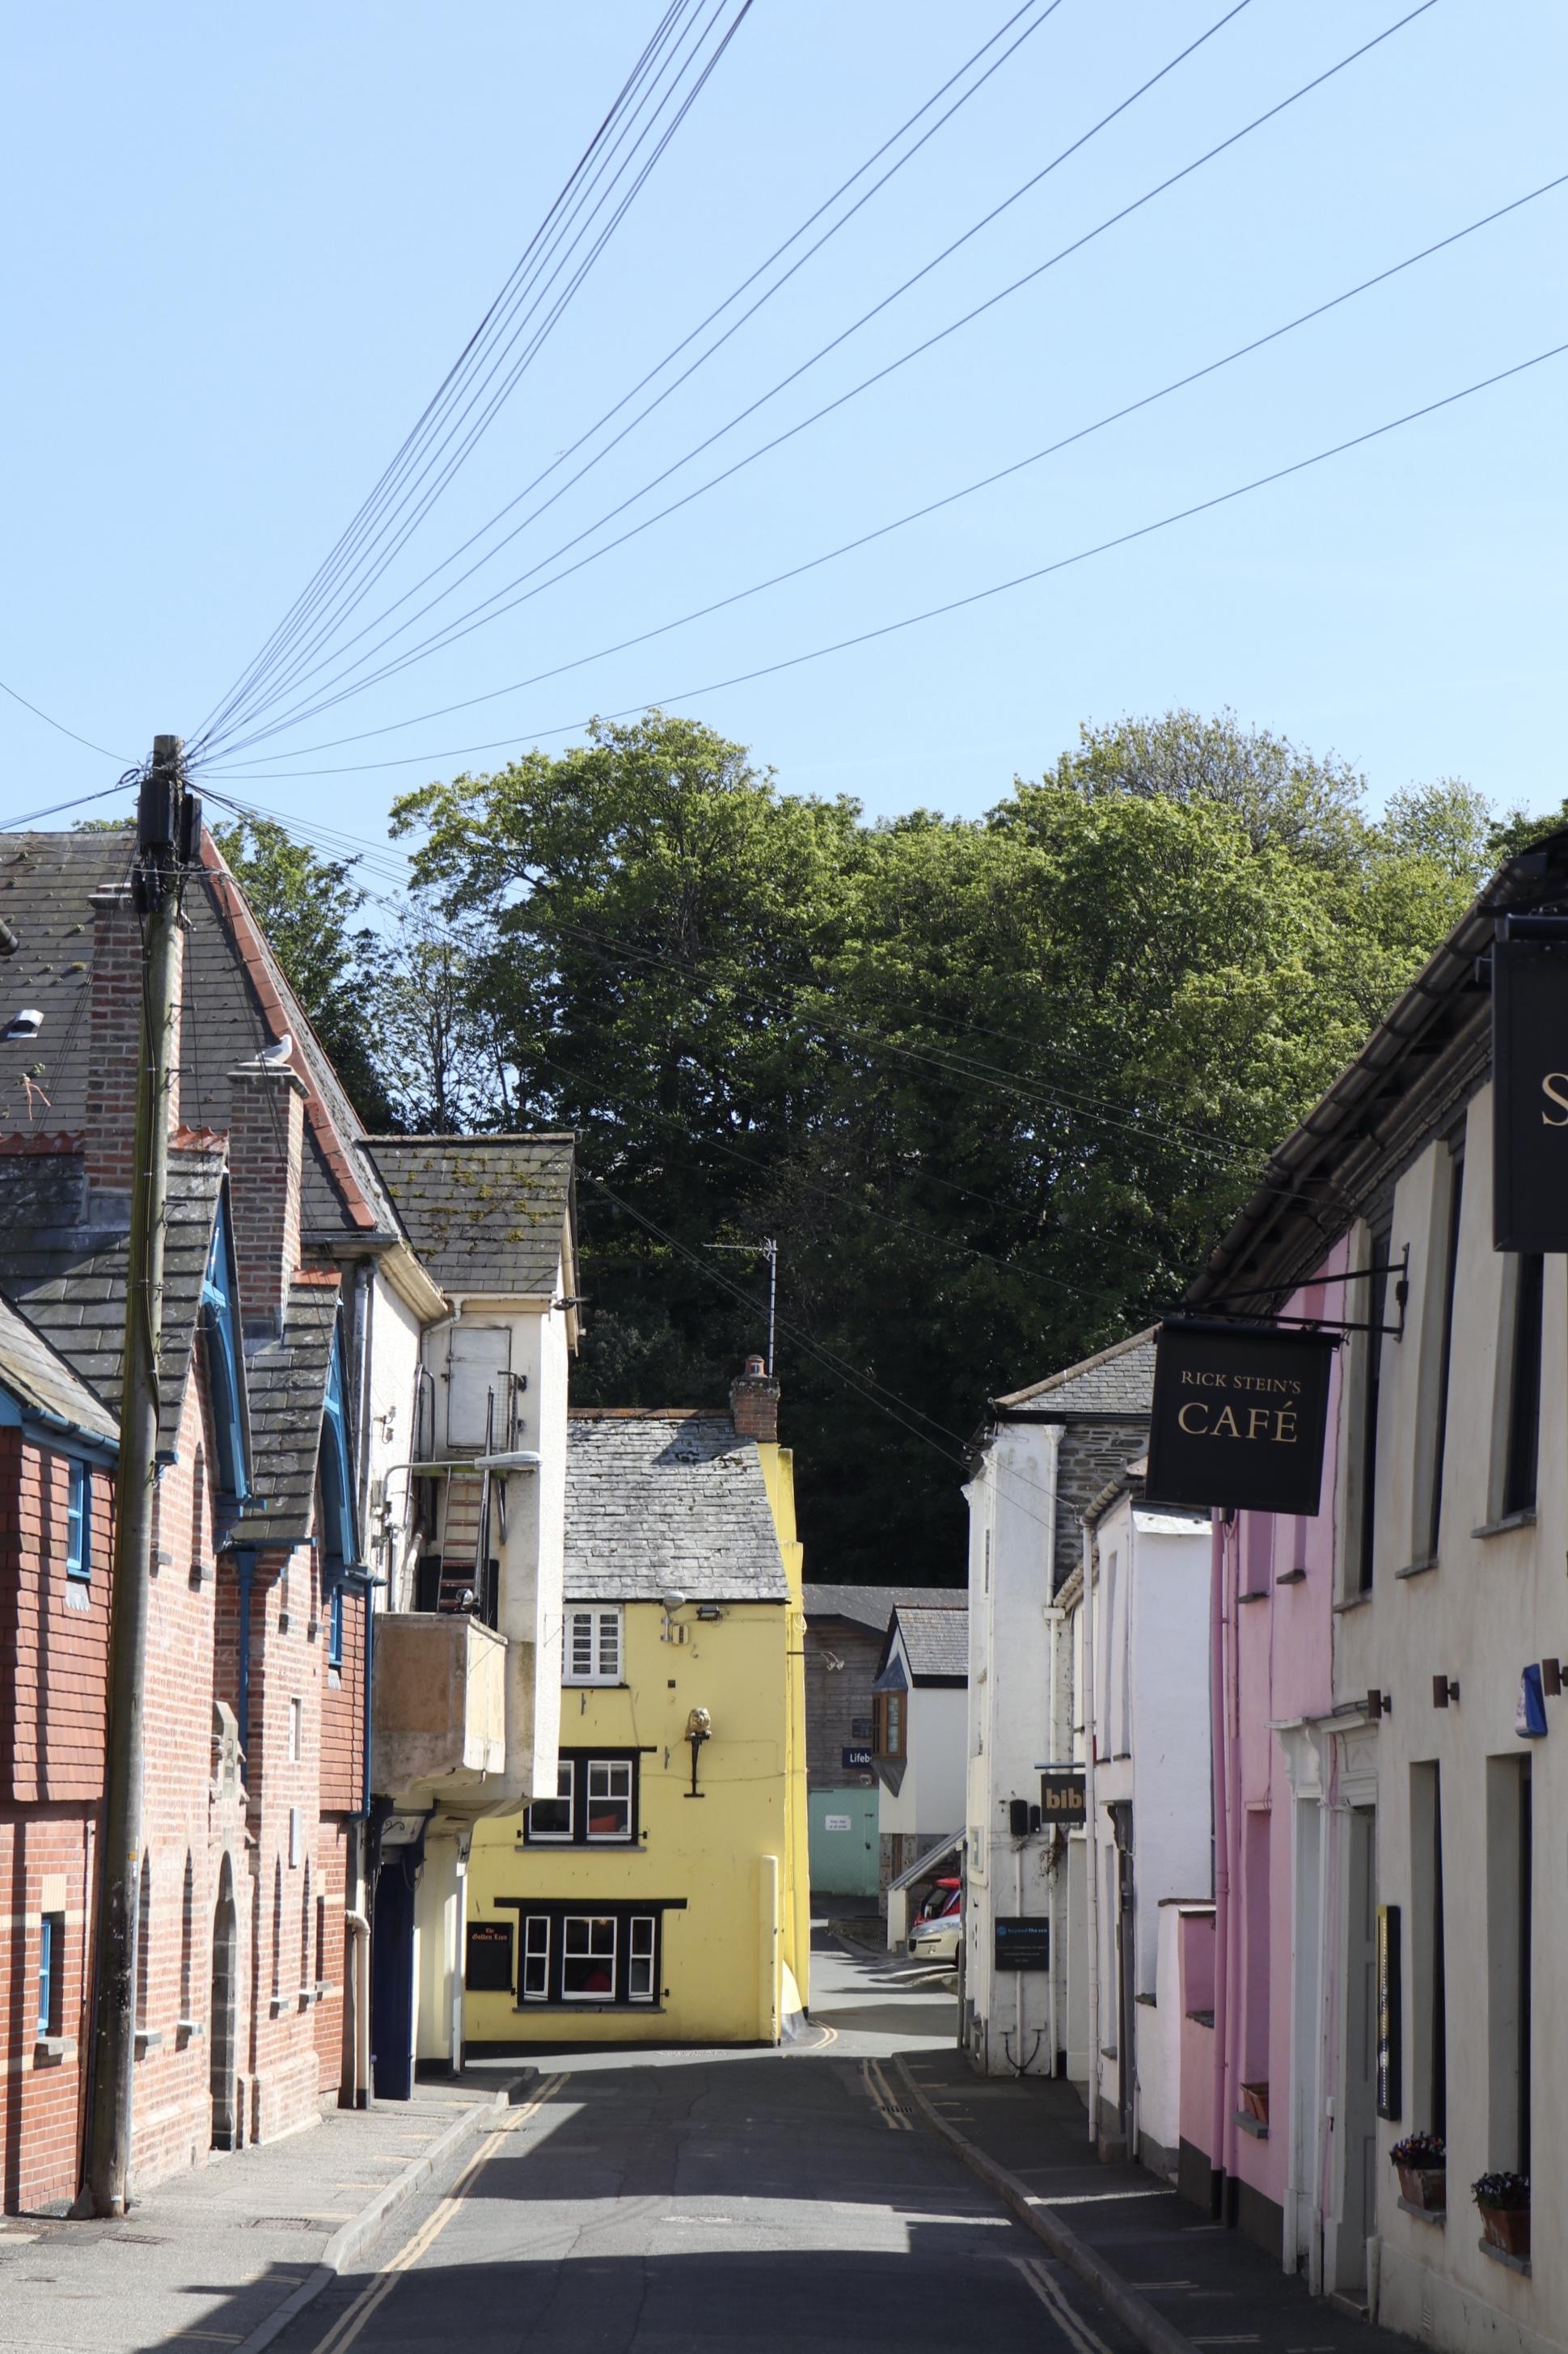 Padstow, Cornwall's foodie haven